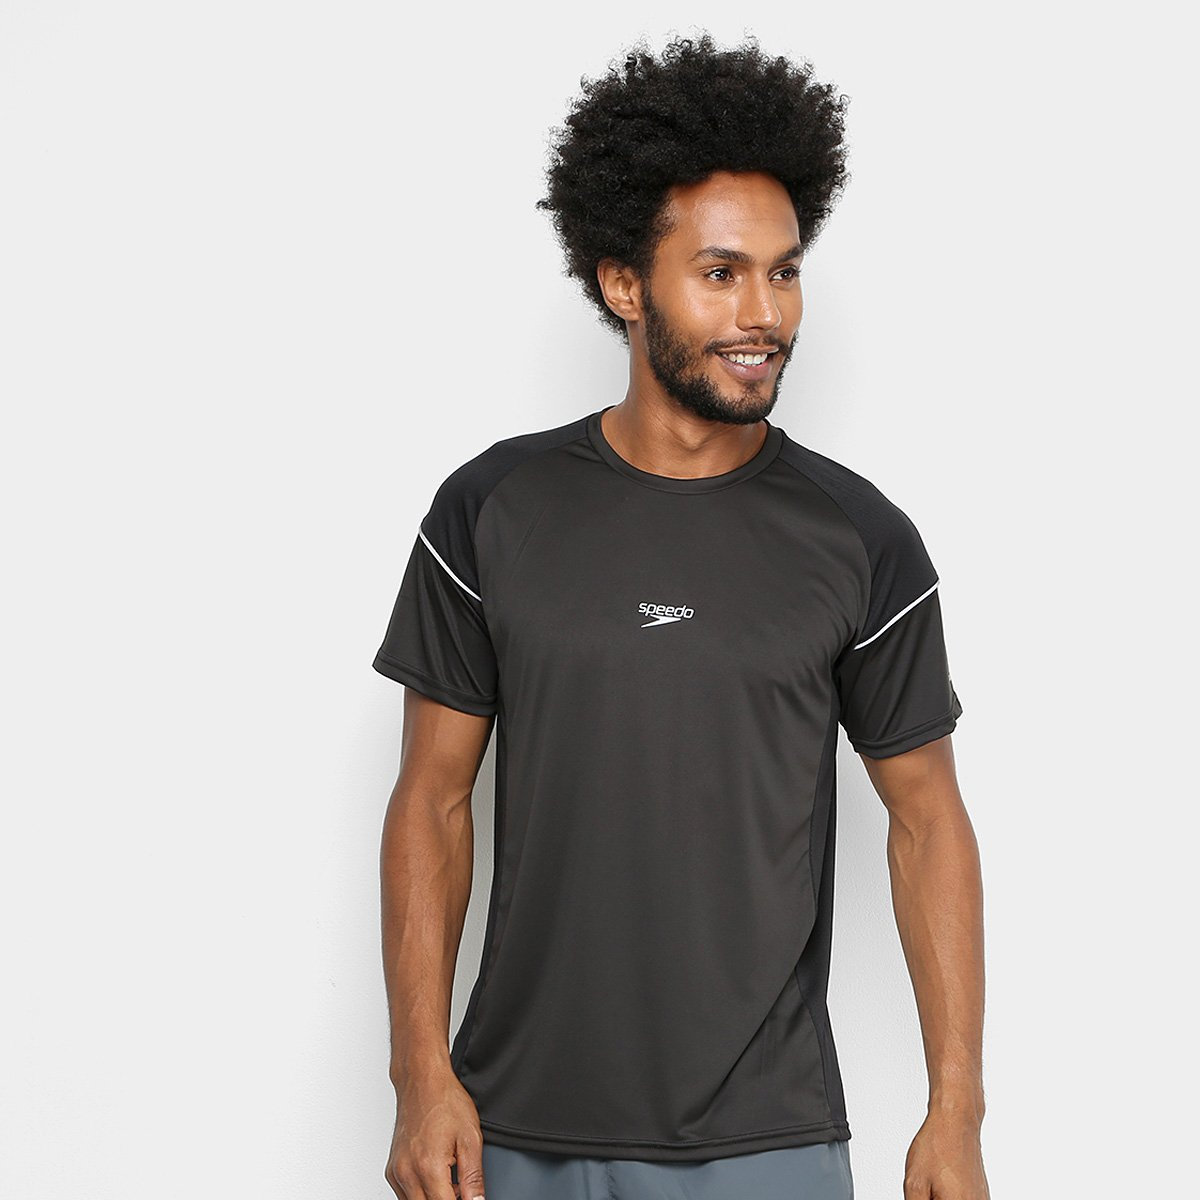 Camiseta Speedo Traction Masculina